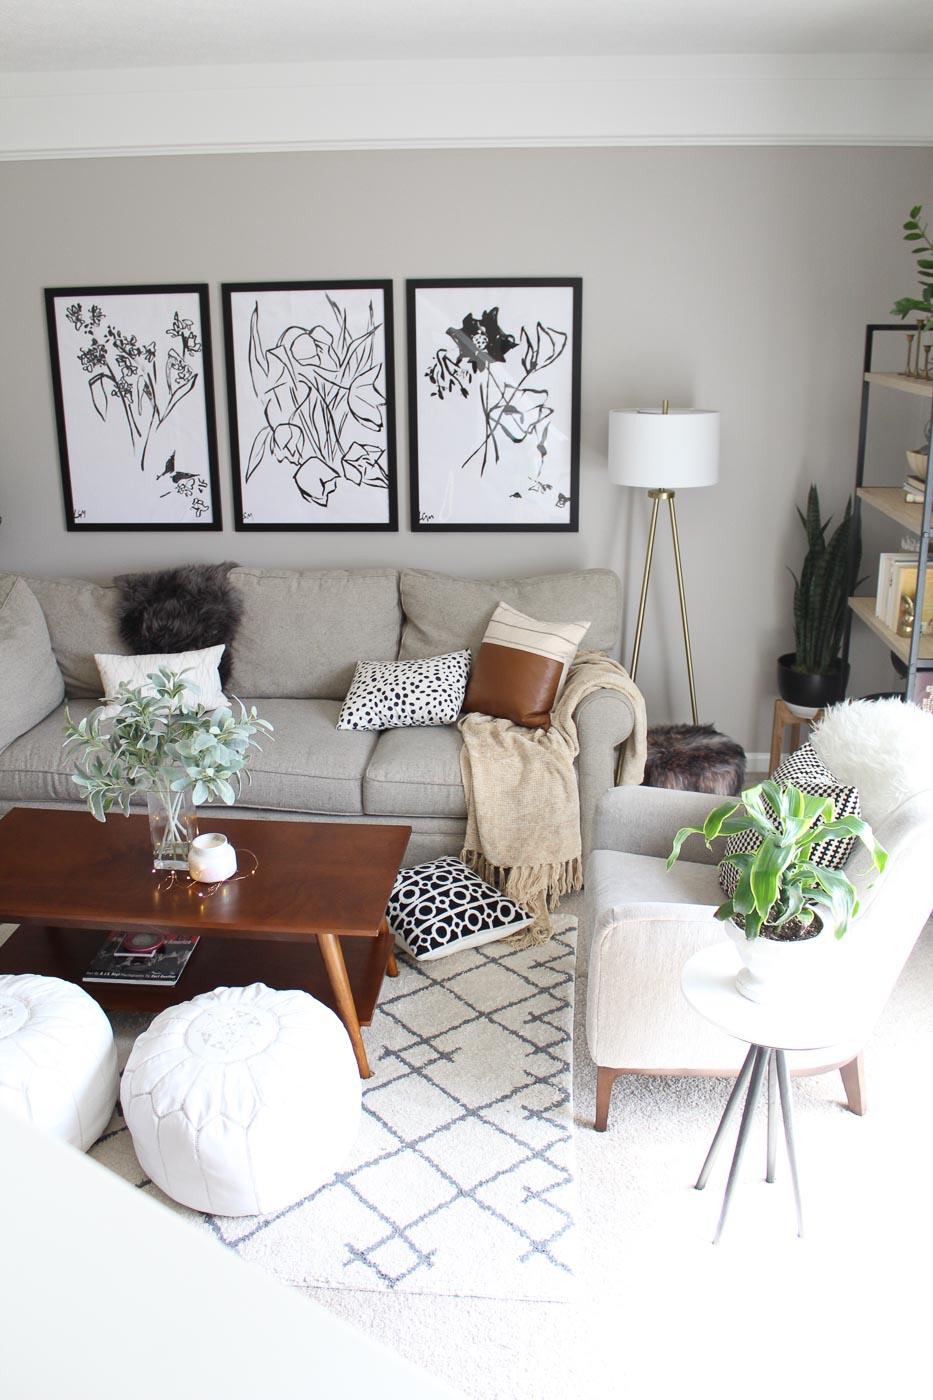 cozy-quarters-ohio-natural-light-photography-studio-lifestyle-photographer-24.jpg